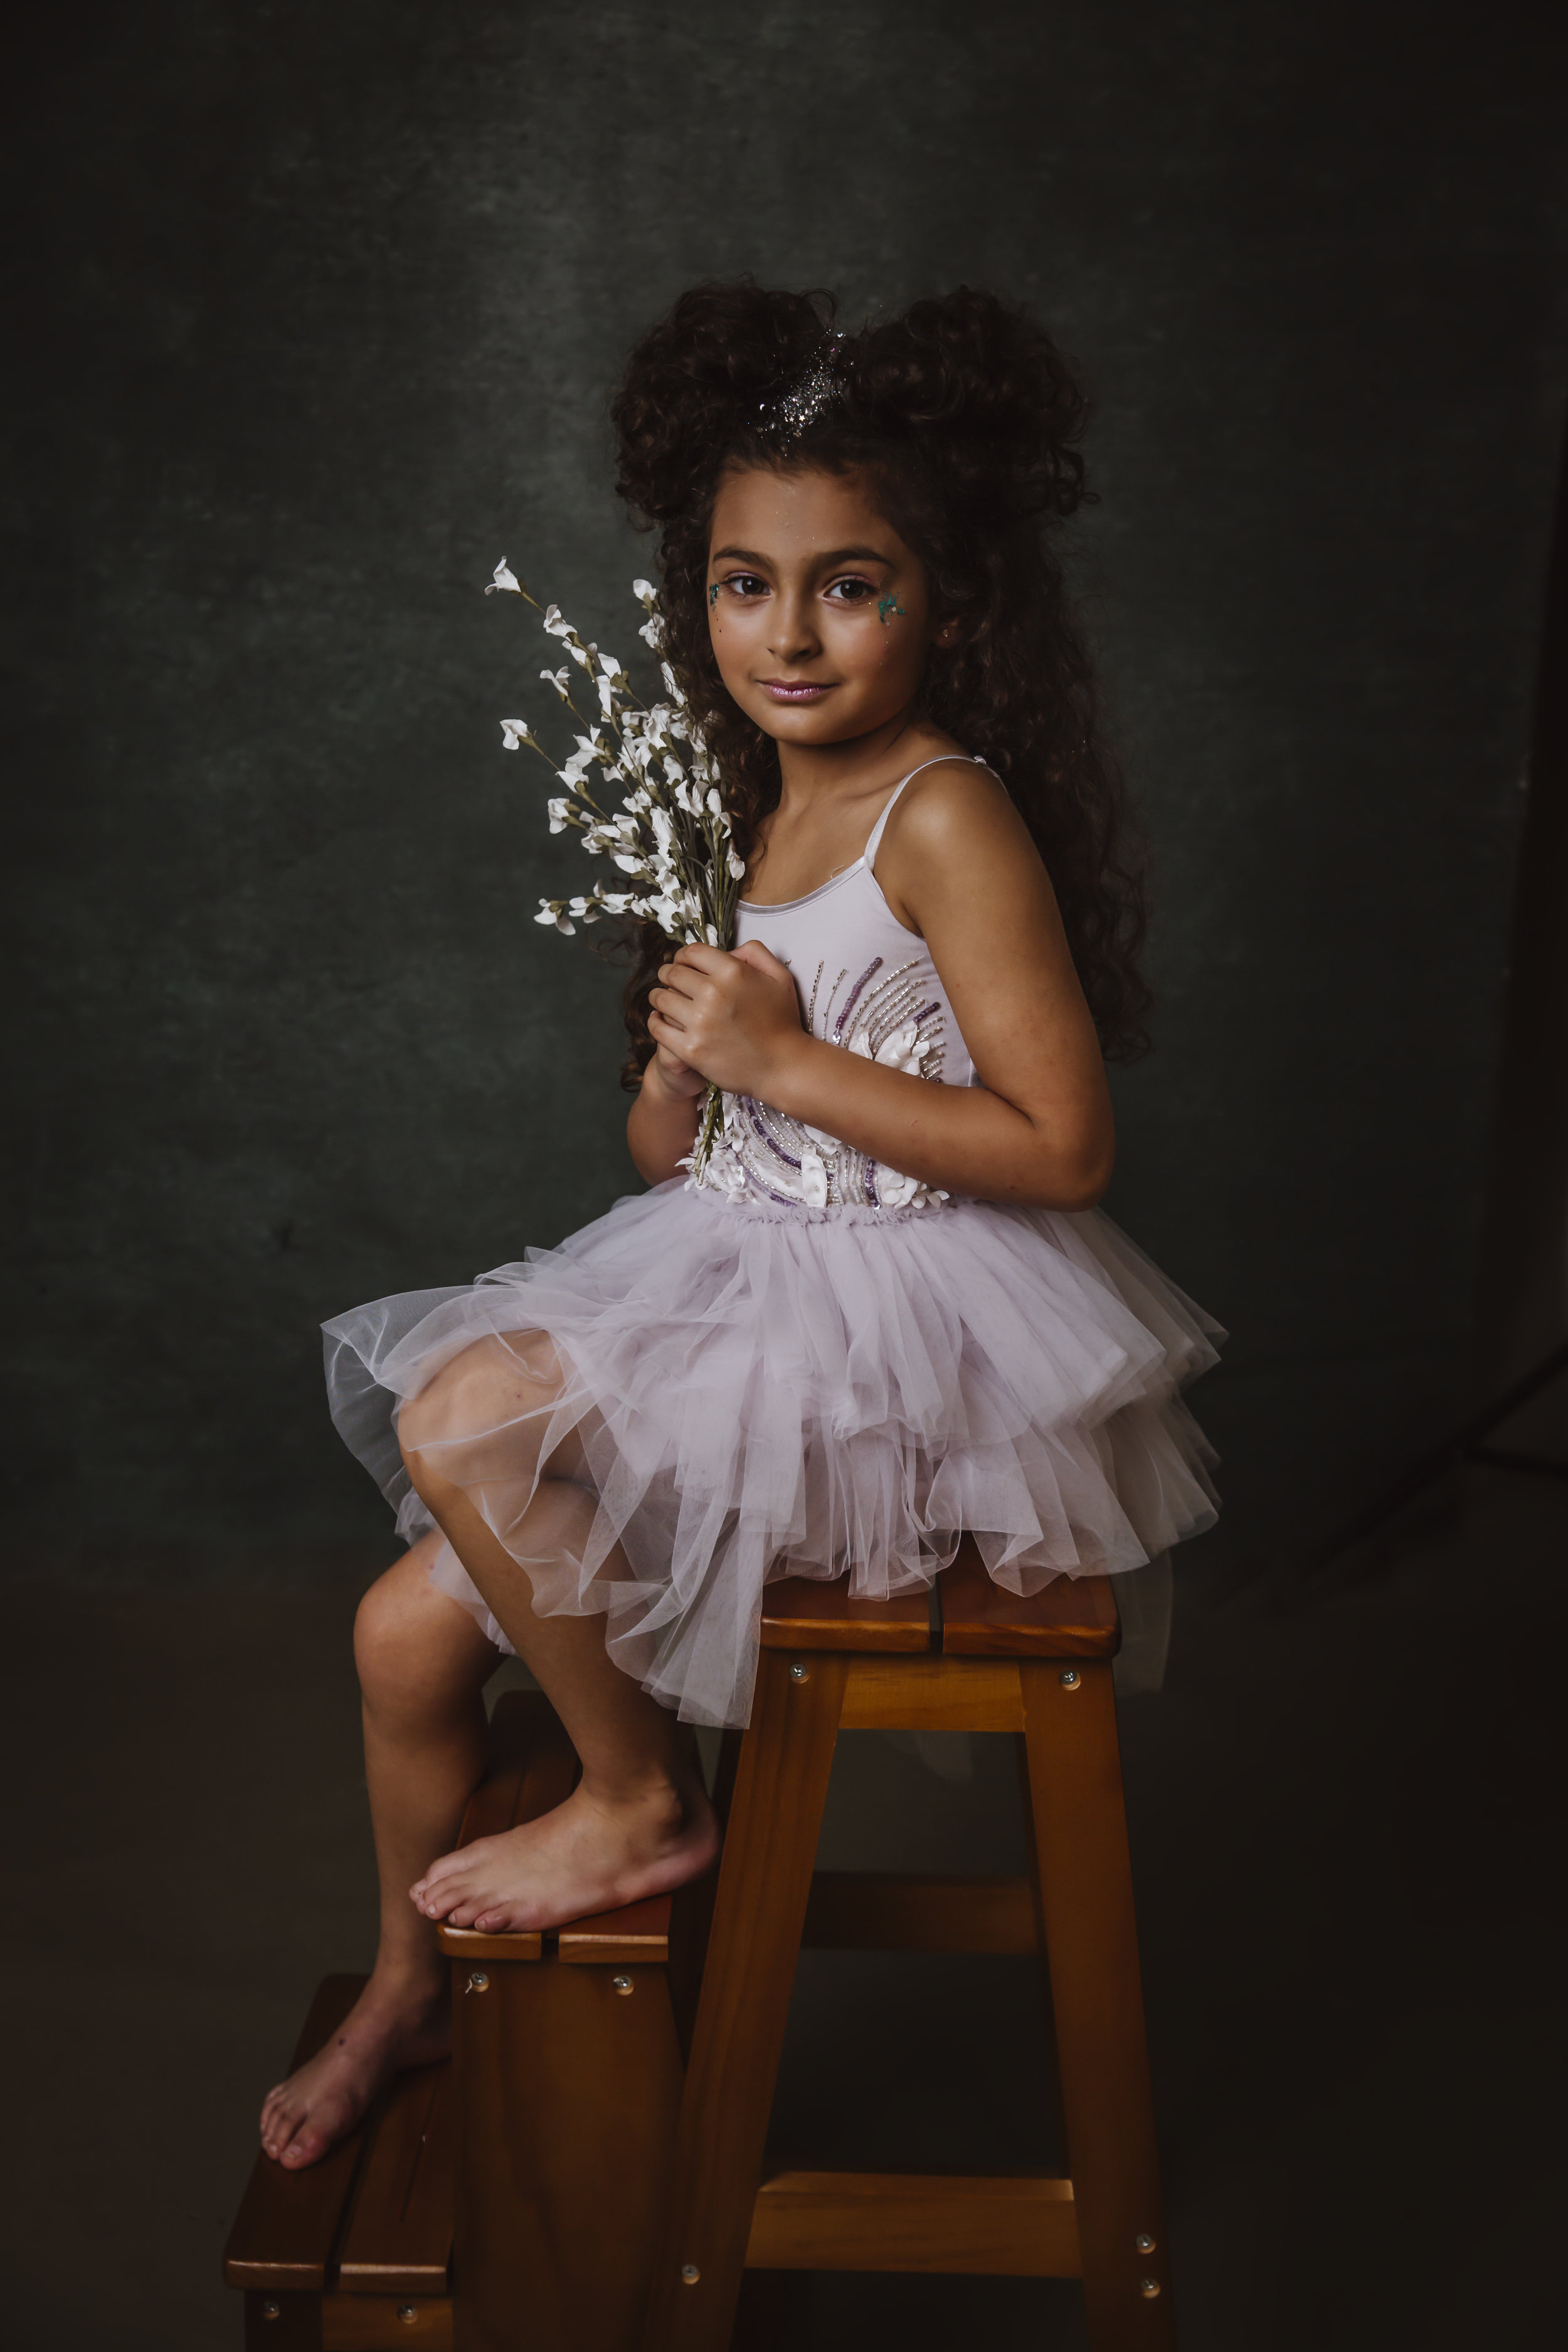 Zinn Photography - 1.JPG